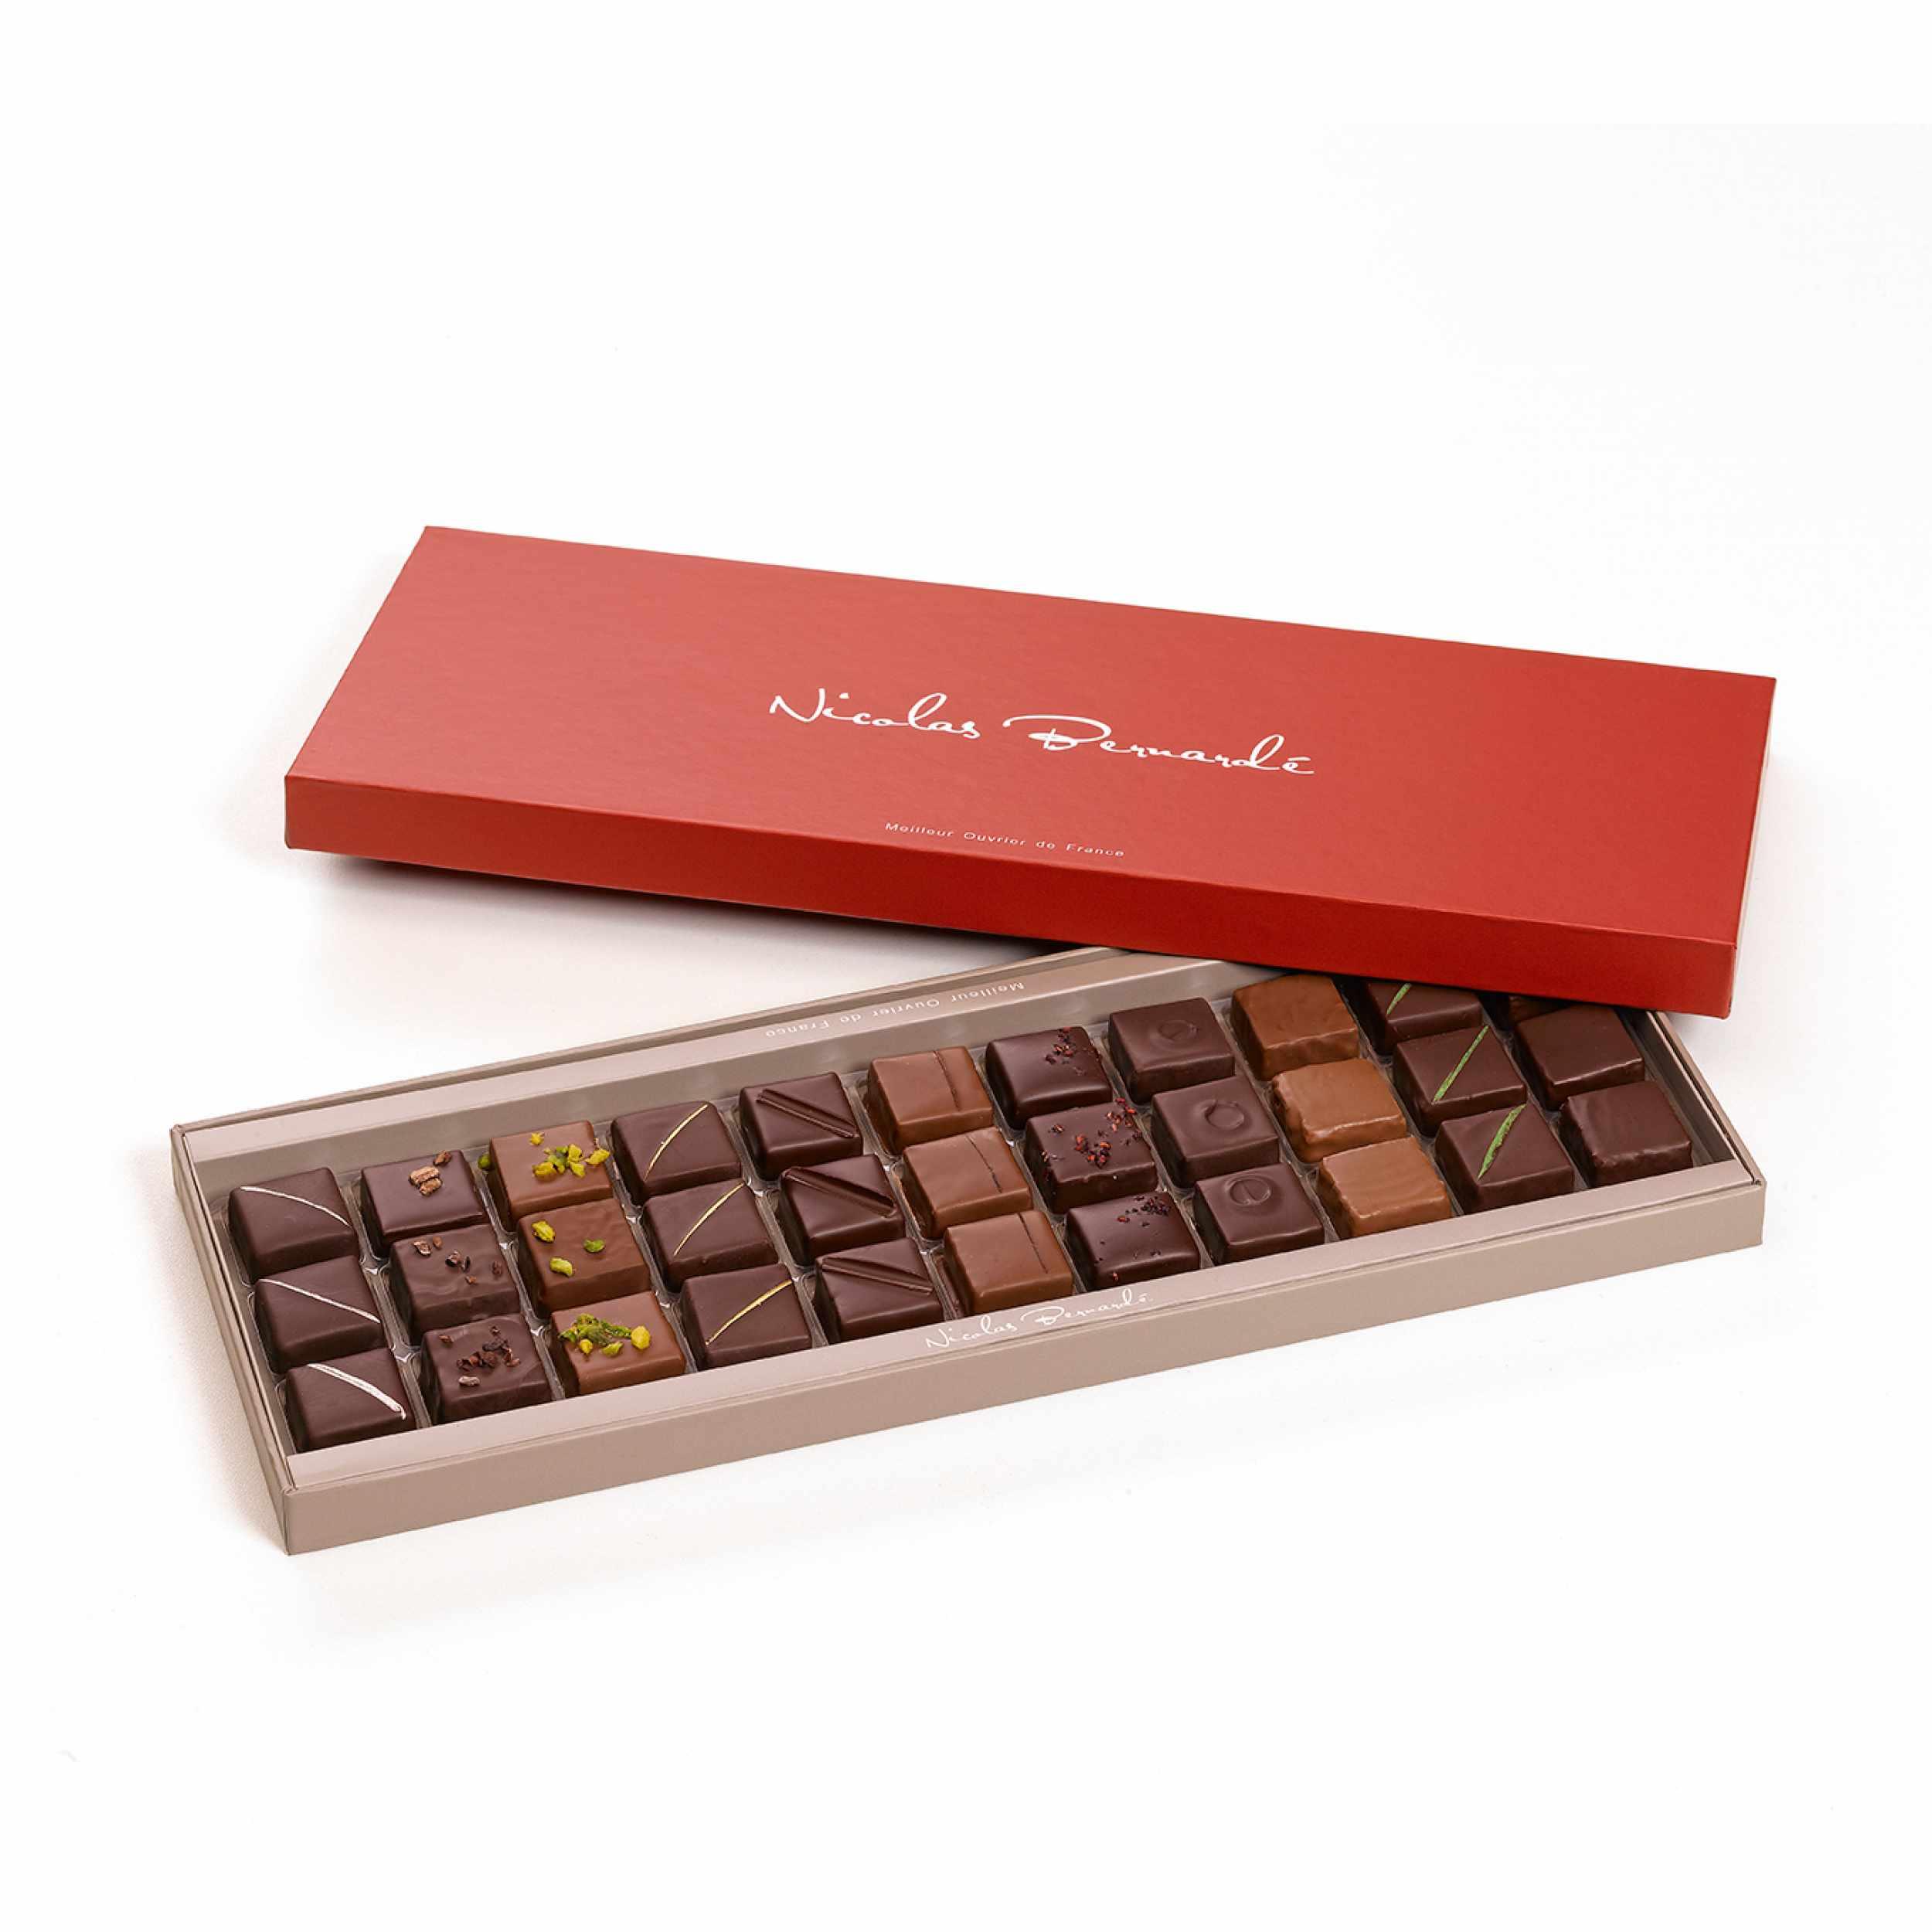 chocolats-assortiment-33-bonbons.jpg